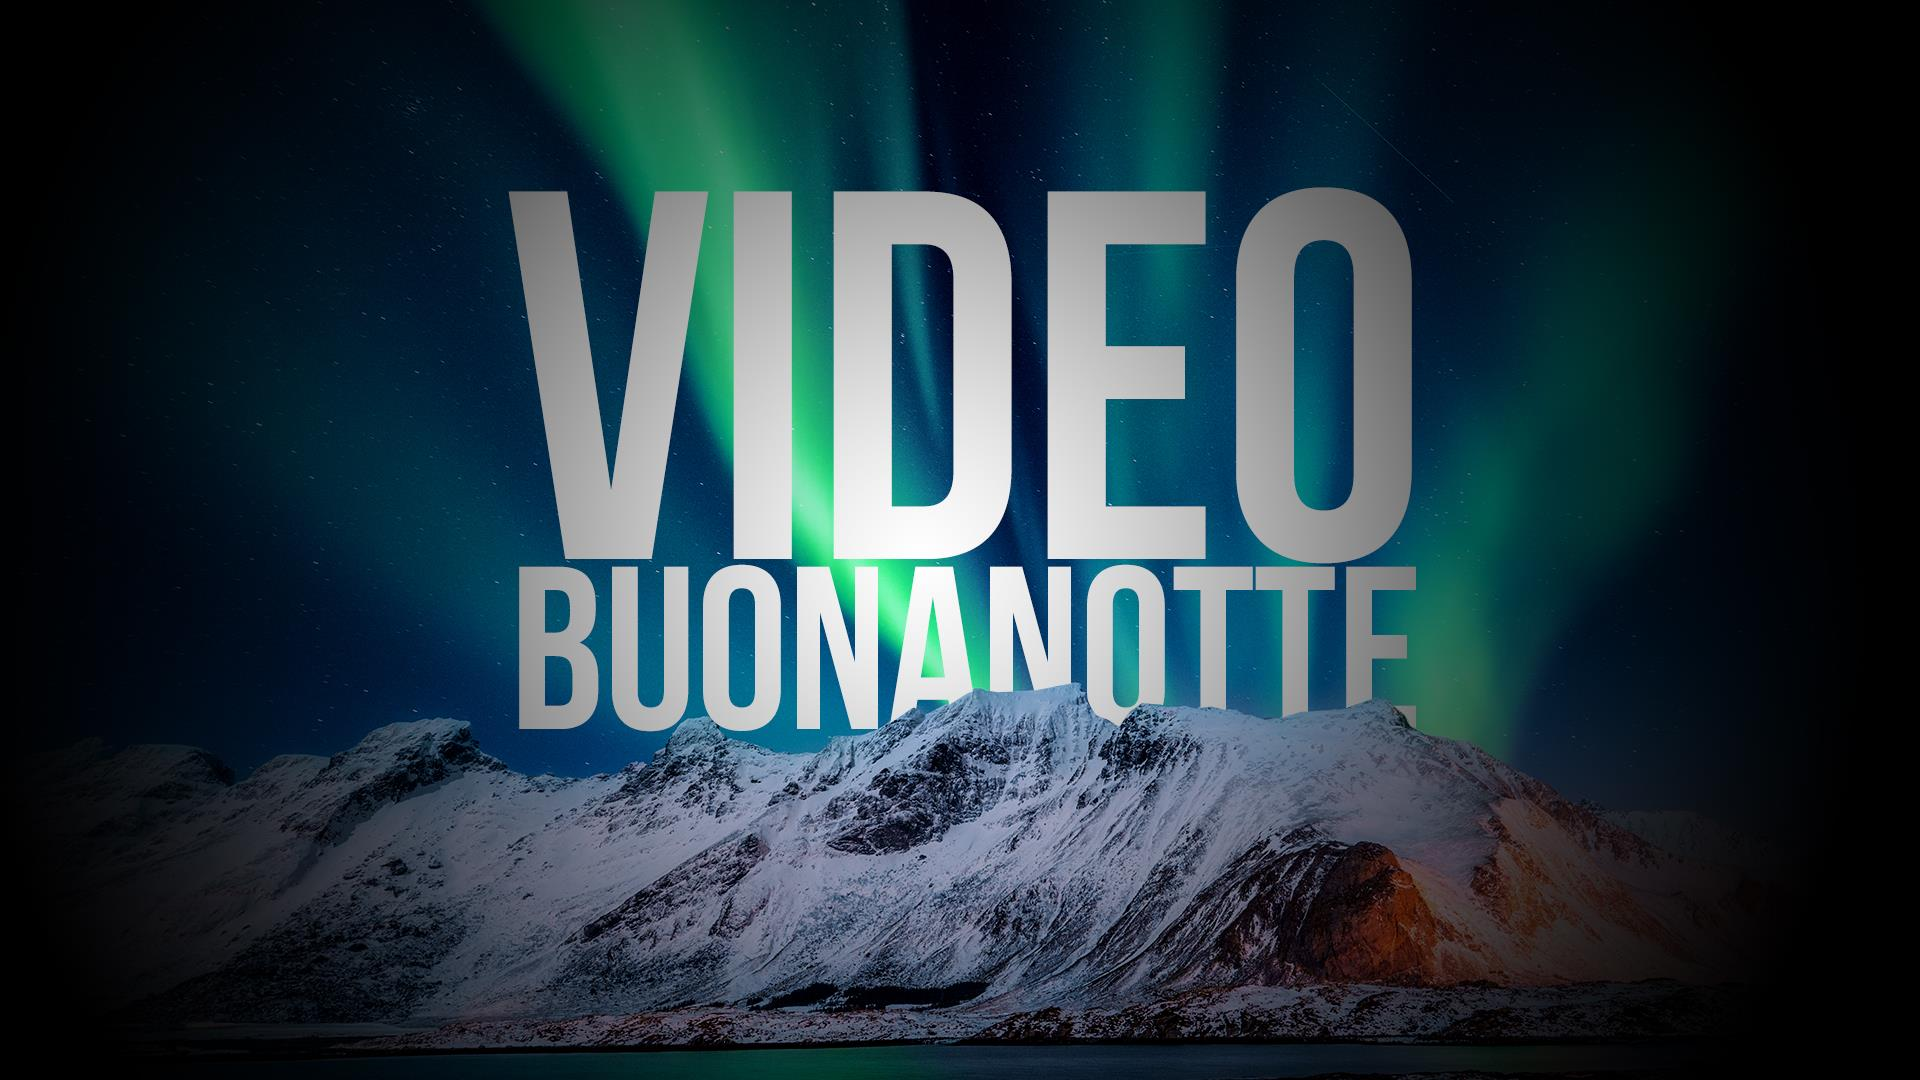 Video Buonanotte I Piu Belli E Divertenti Per Whatsapp